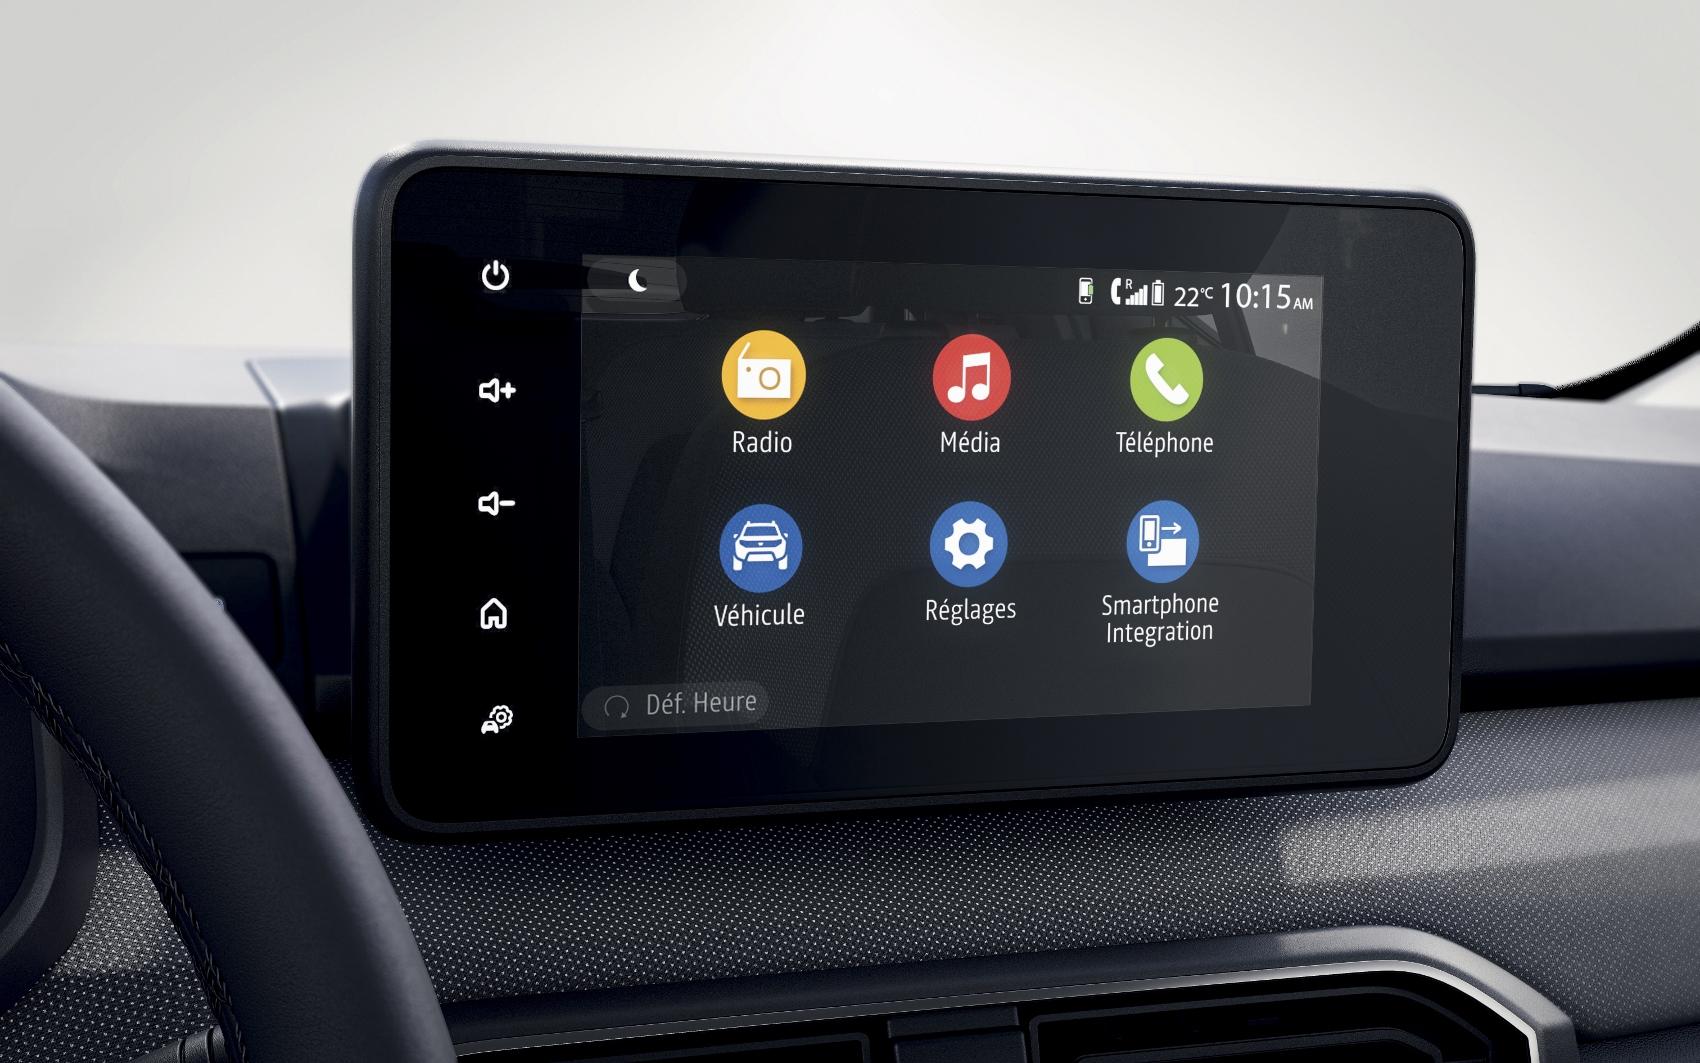 2020 - New Dacia SANDERO (10) (1700x1063)